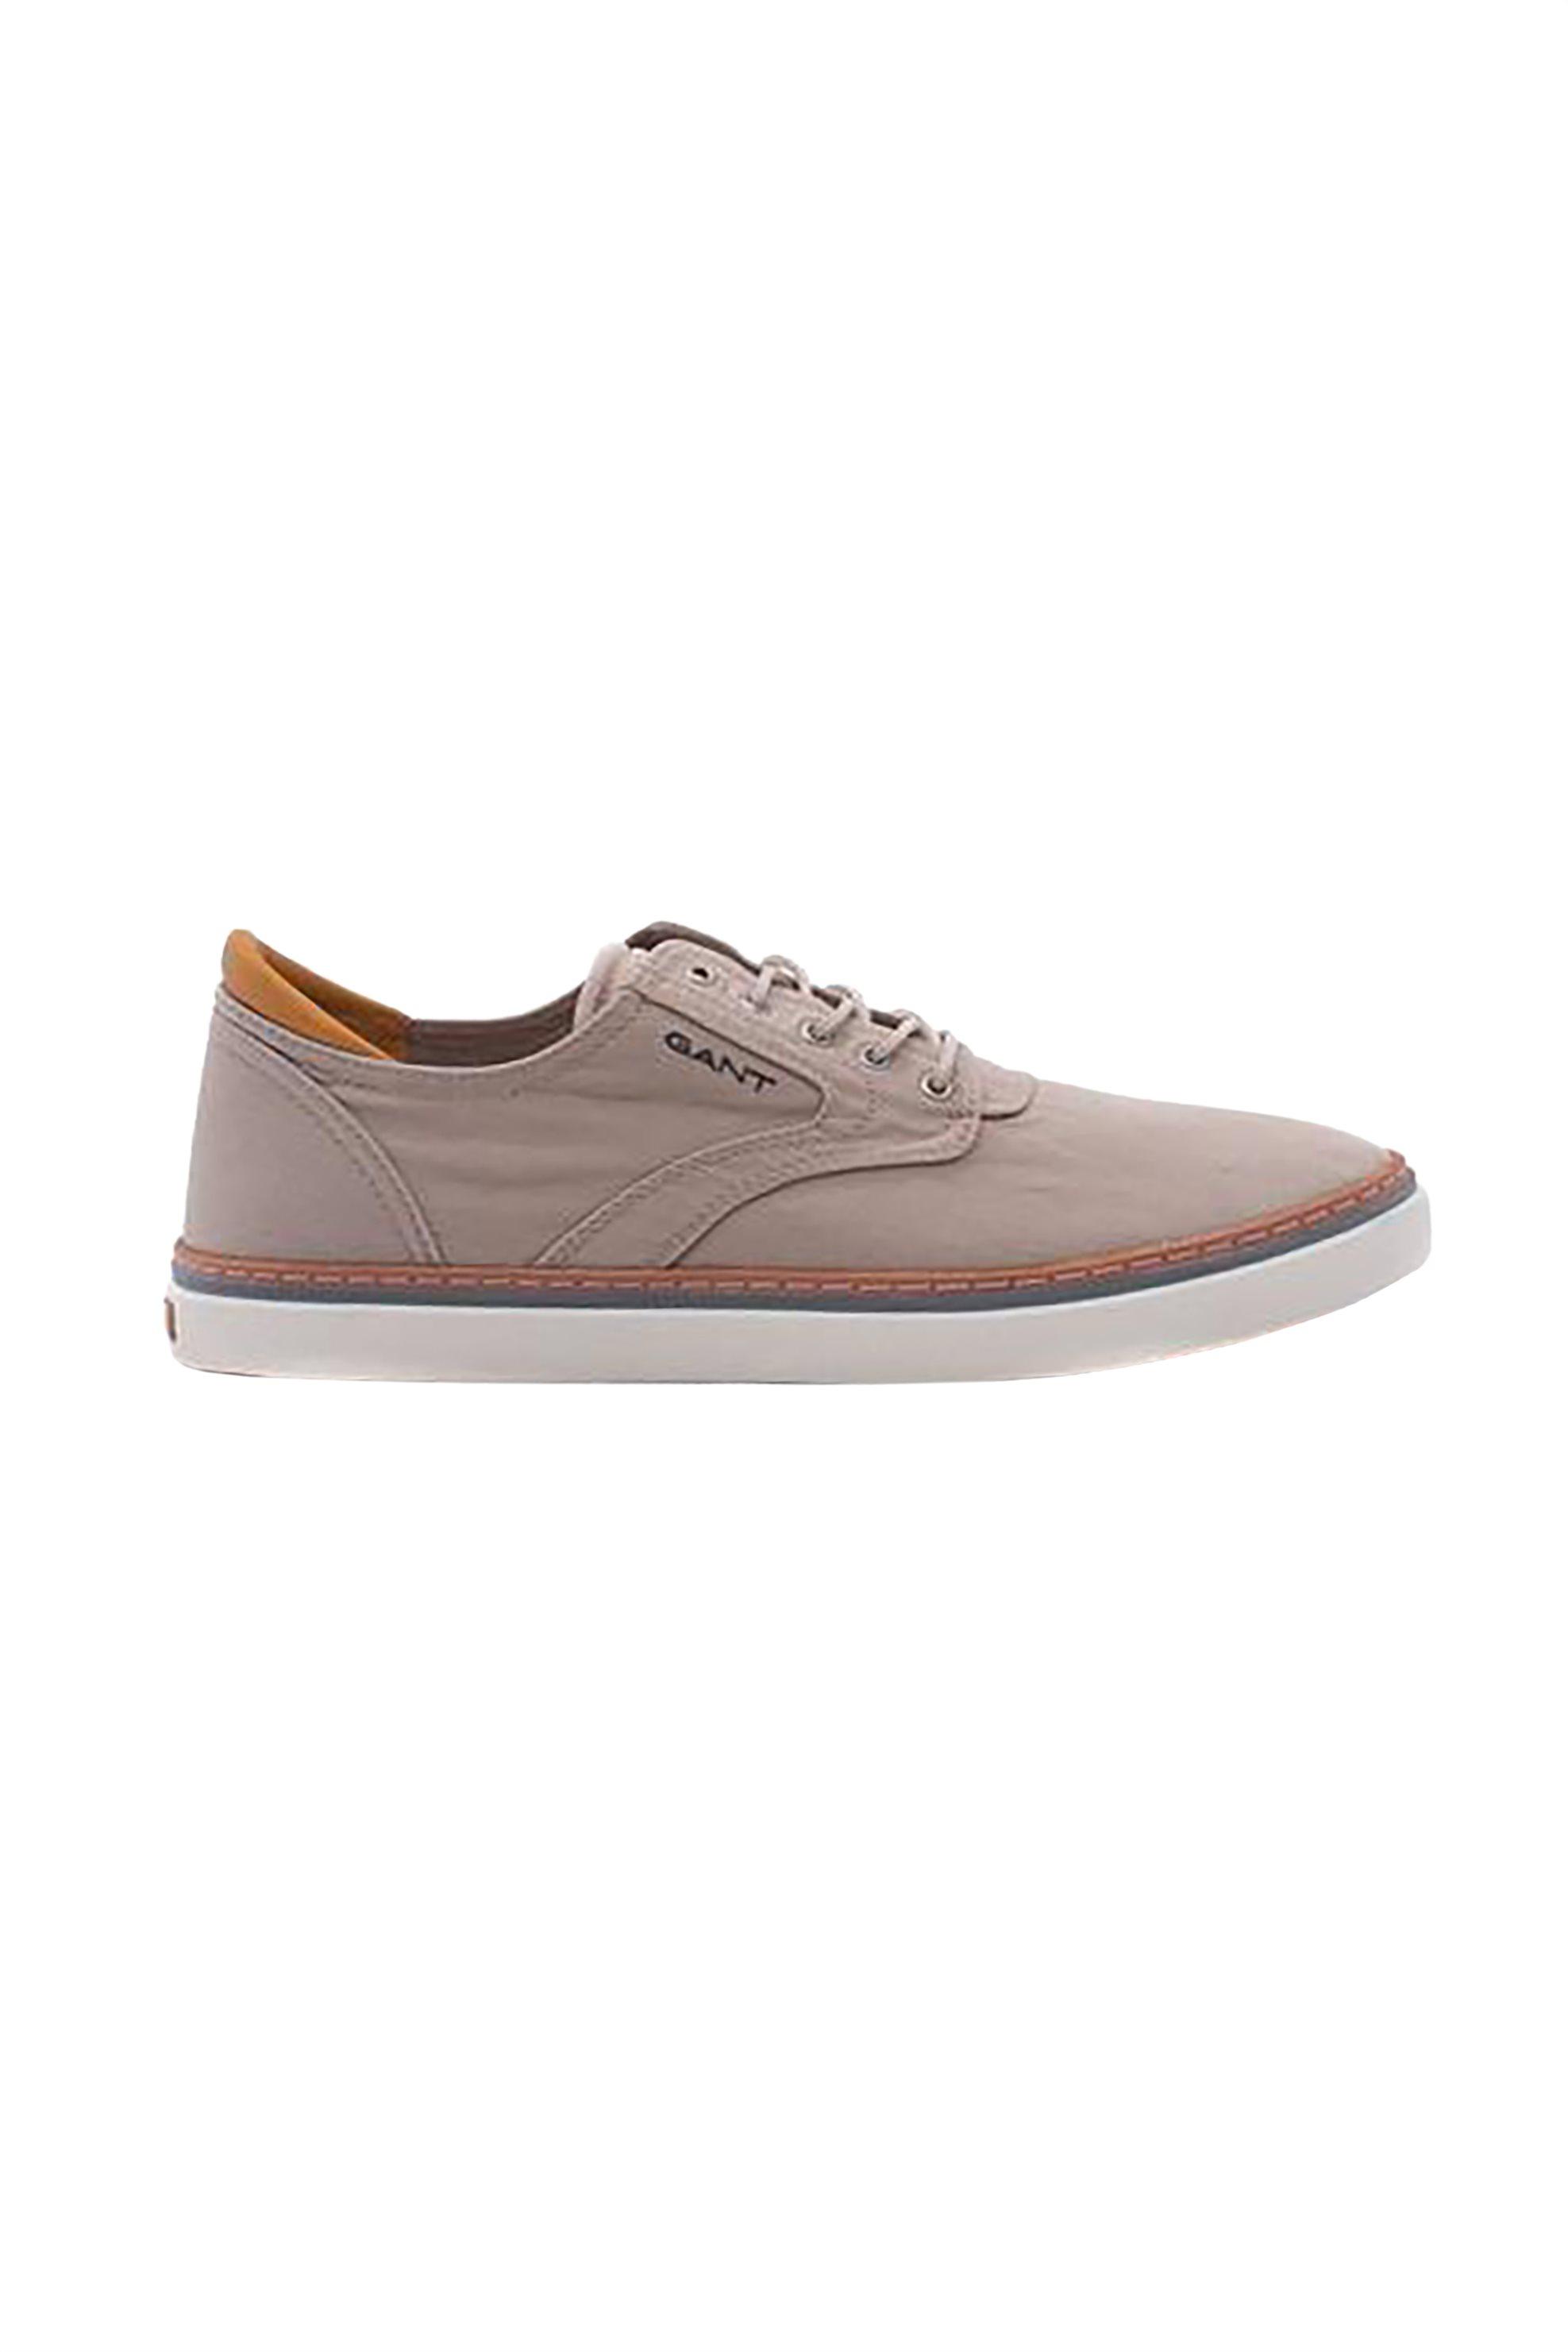 "Gant ανδρικά sneakers με κορδόνια ""Prepville"" – 20638499 – Μπεζ"